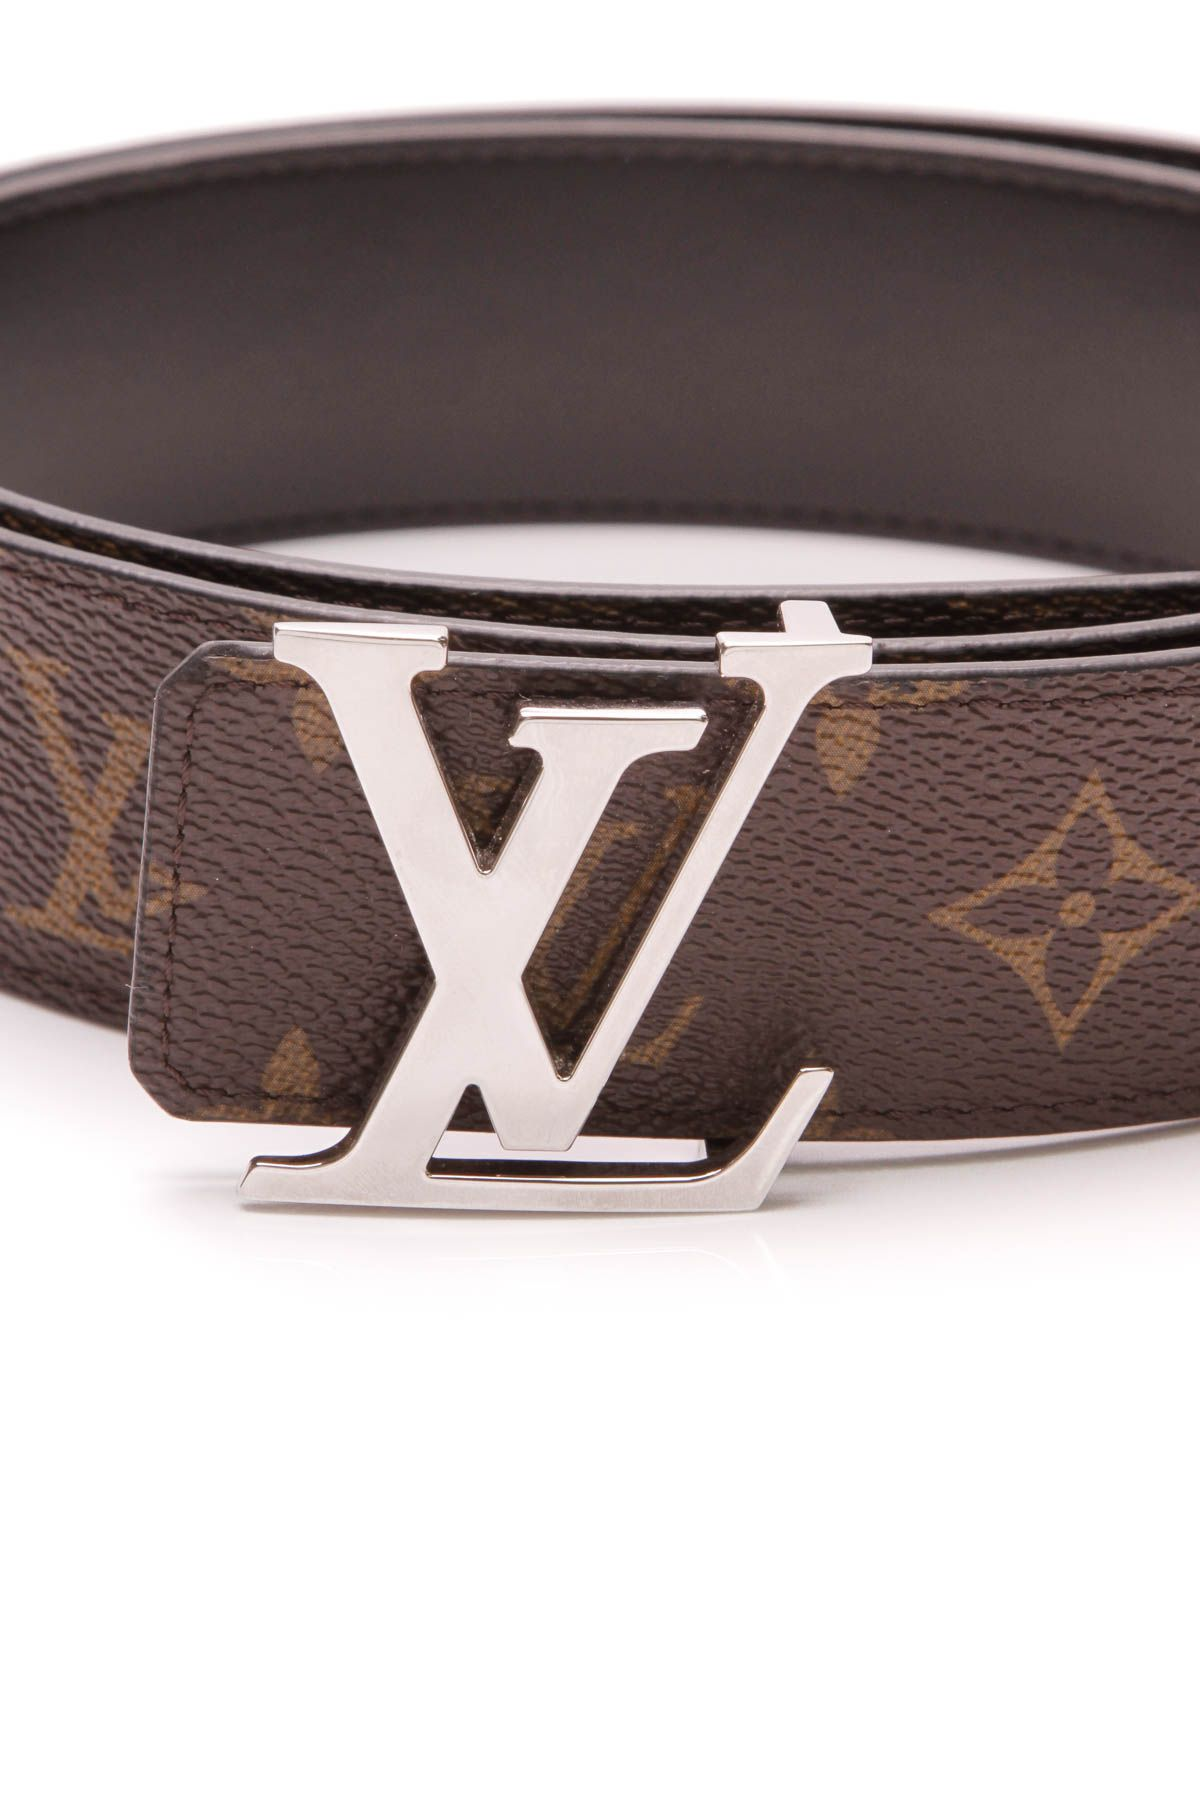 Louis Vuitton LV initials belt in monogram canvas Louis